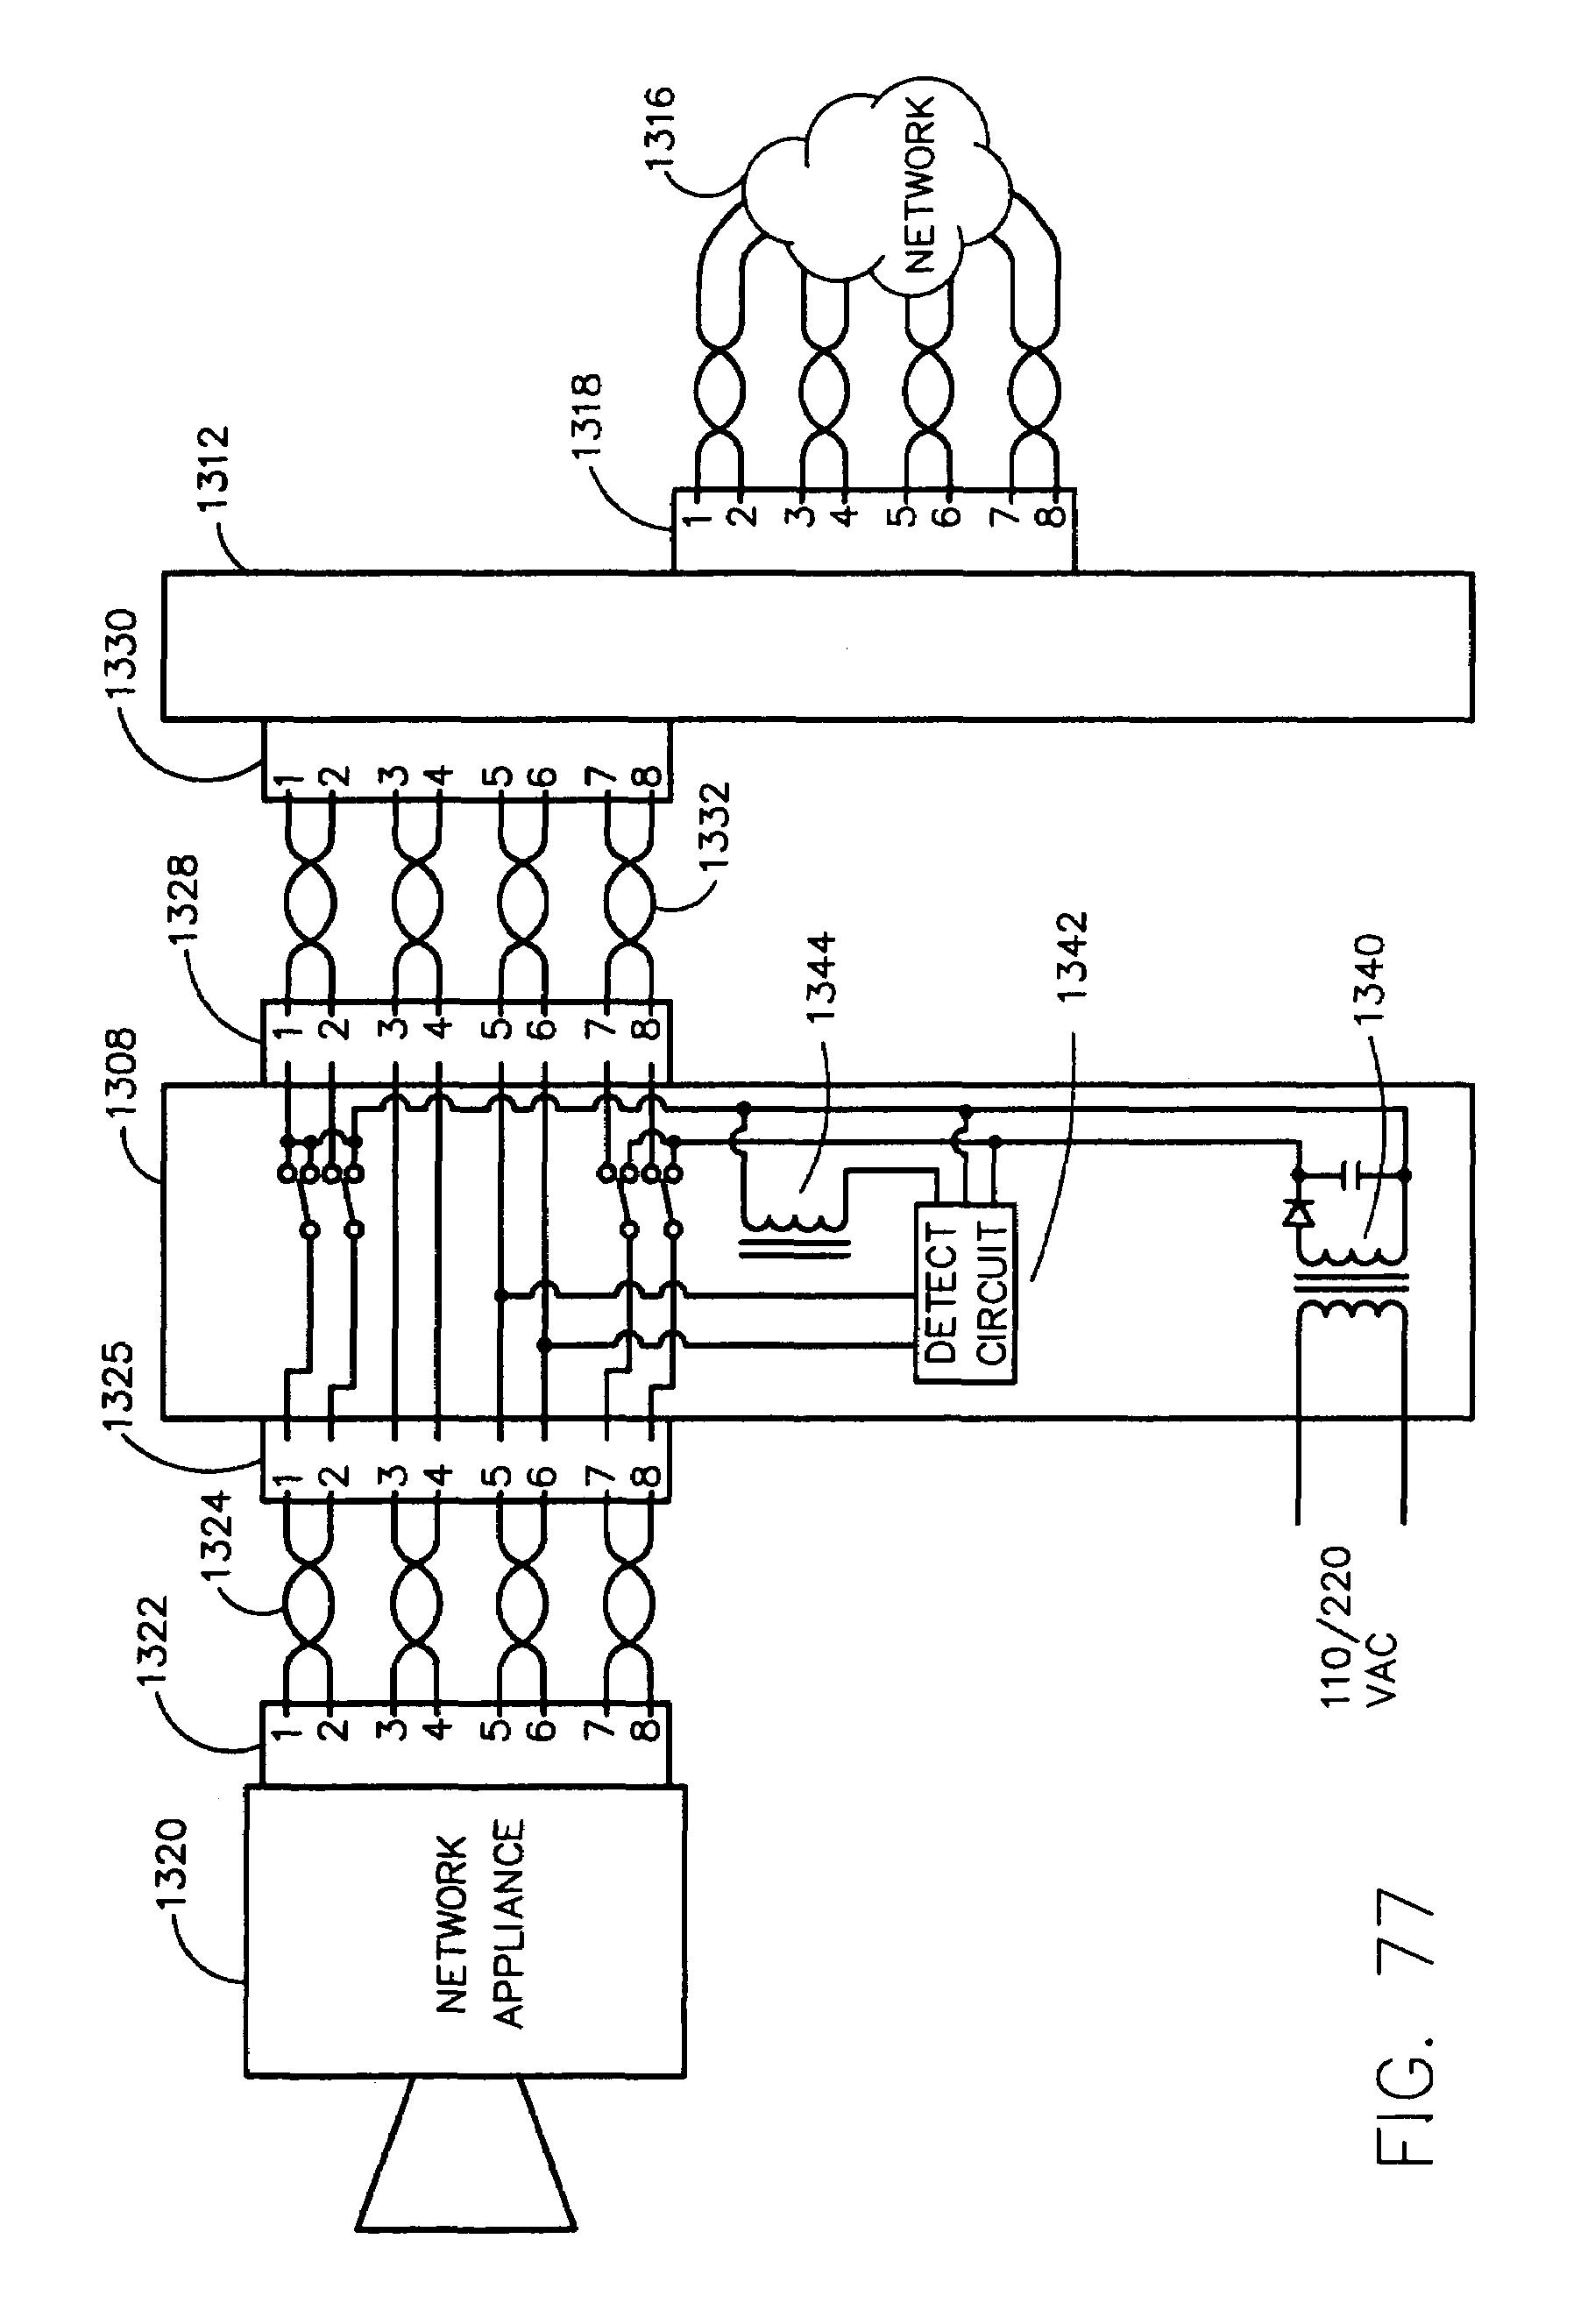 Patent Us 6970183 B1 Ih 784 Wiring Diagram Litigations